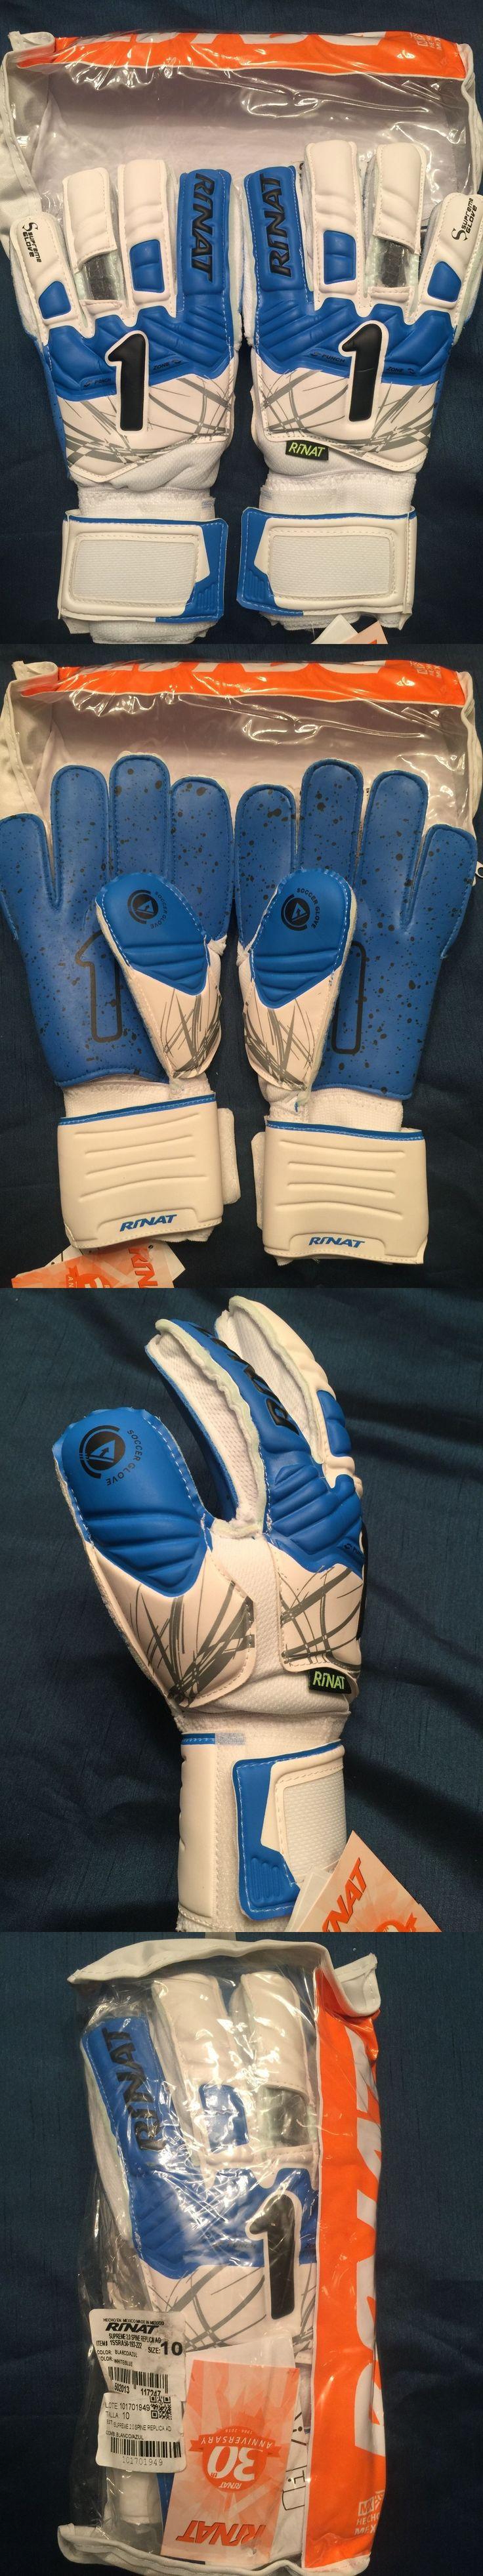 Gloves 57277: New Rinat Supreme Spine 2.0 Goalie Soccer Glove Size 10, Goalkeeper, Futbol -> BUY IT NOW ONLY: $38.9 on eBay!